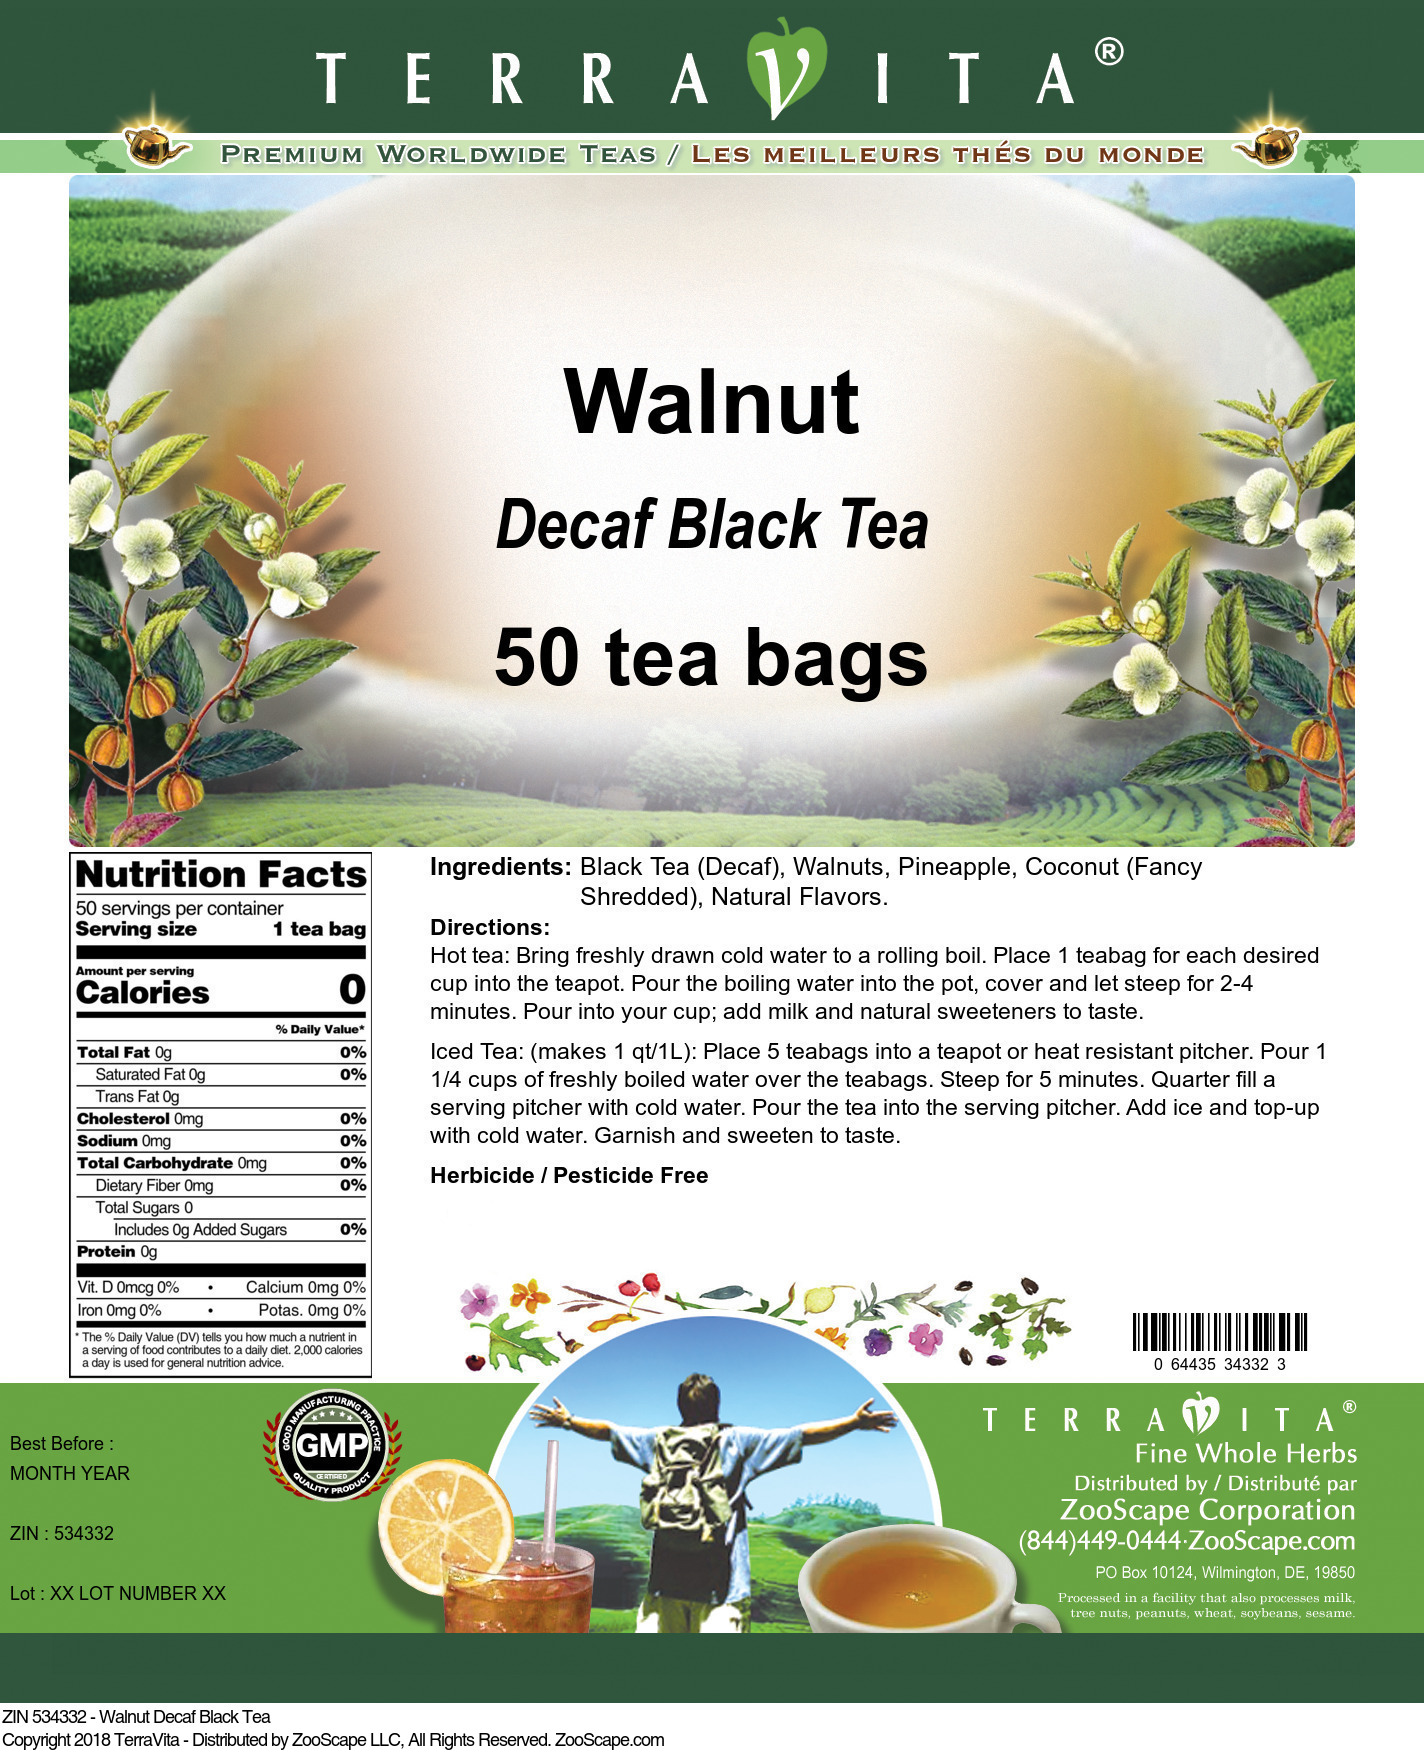 Walnut Decaf Black Tea